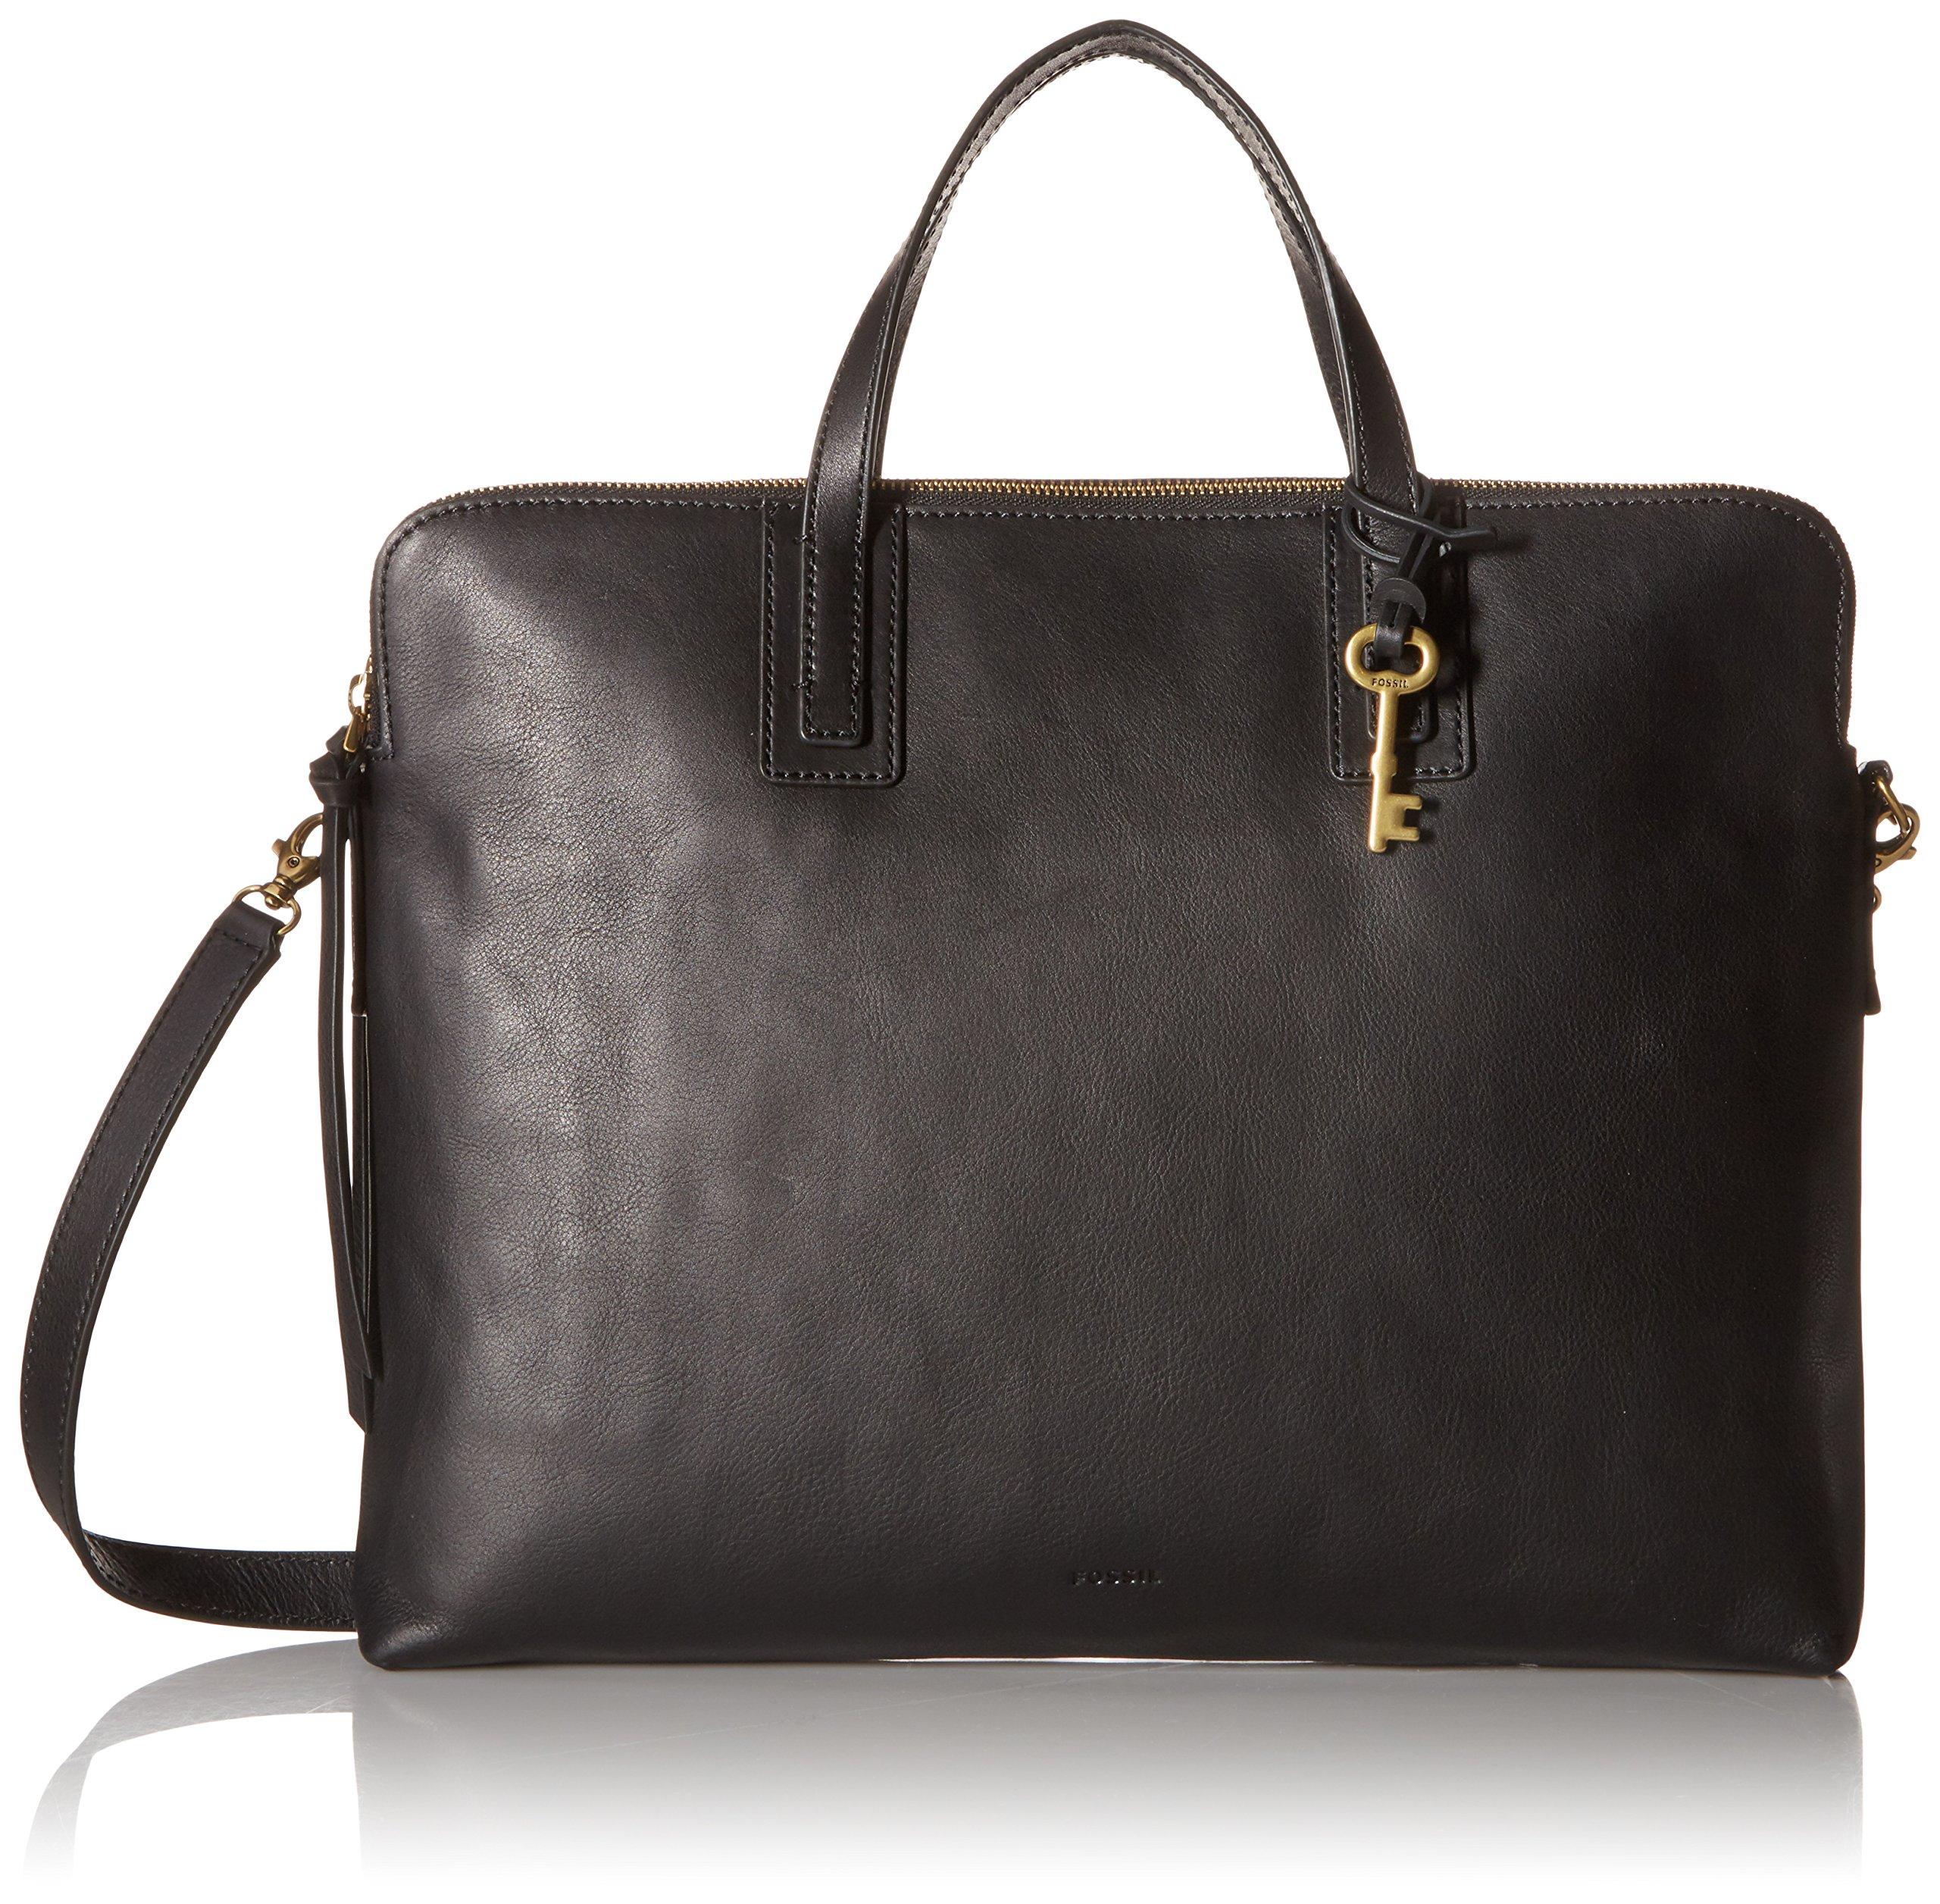 Fossil Emma Laptop Bag, Black, One Size